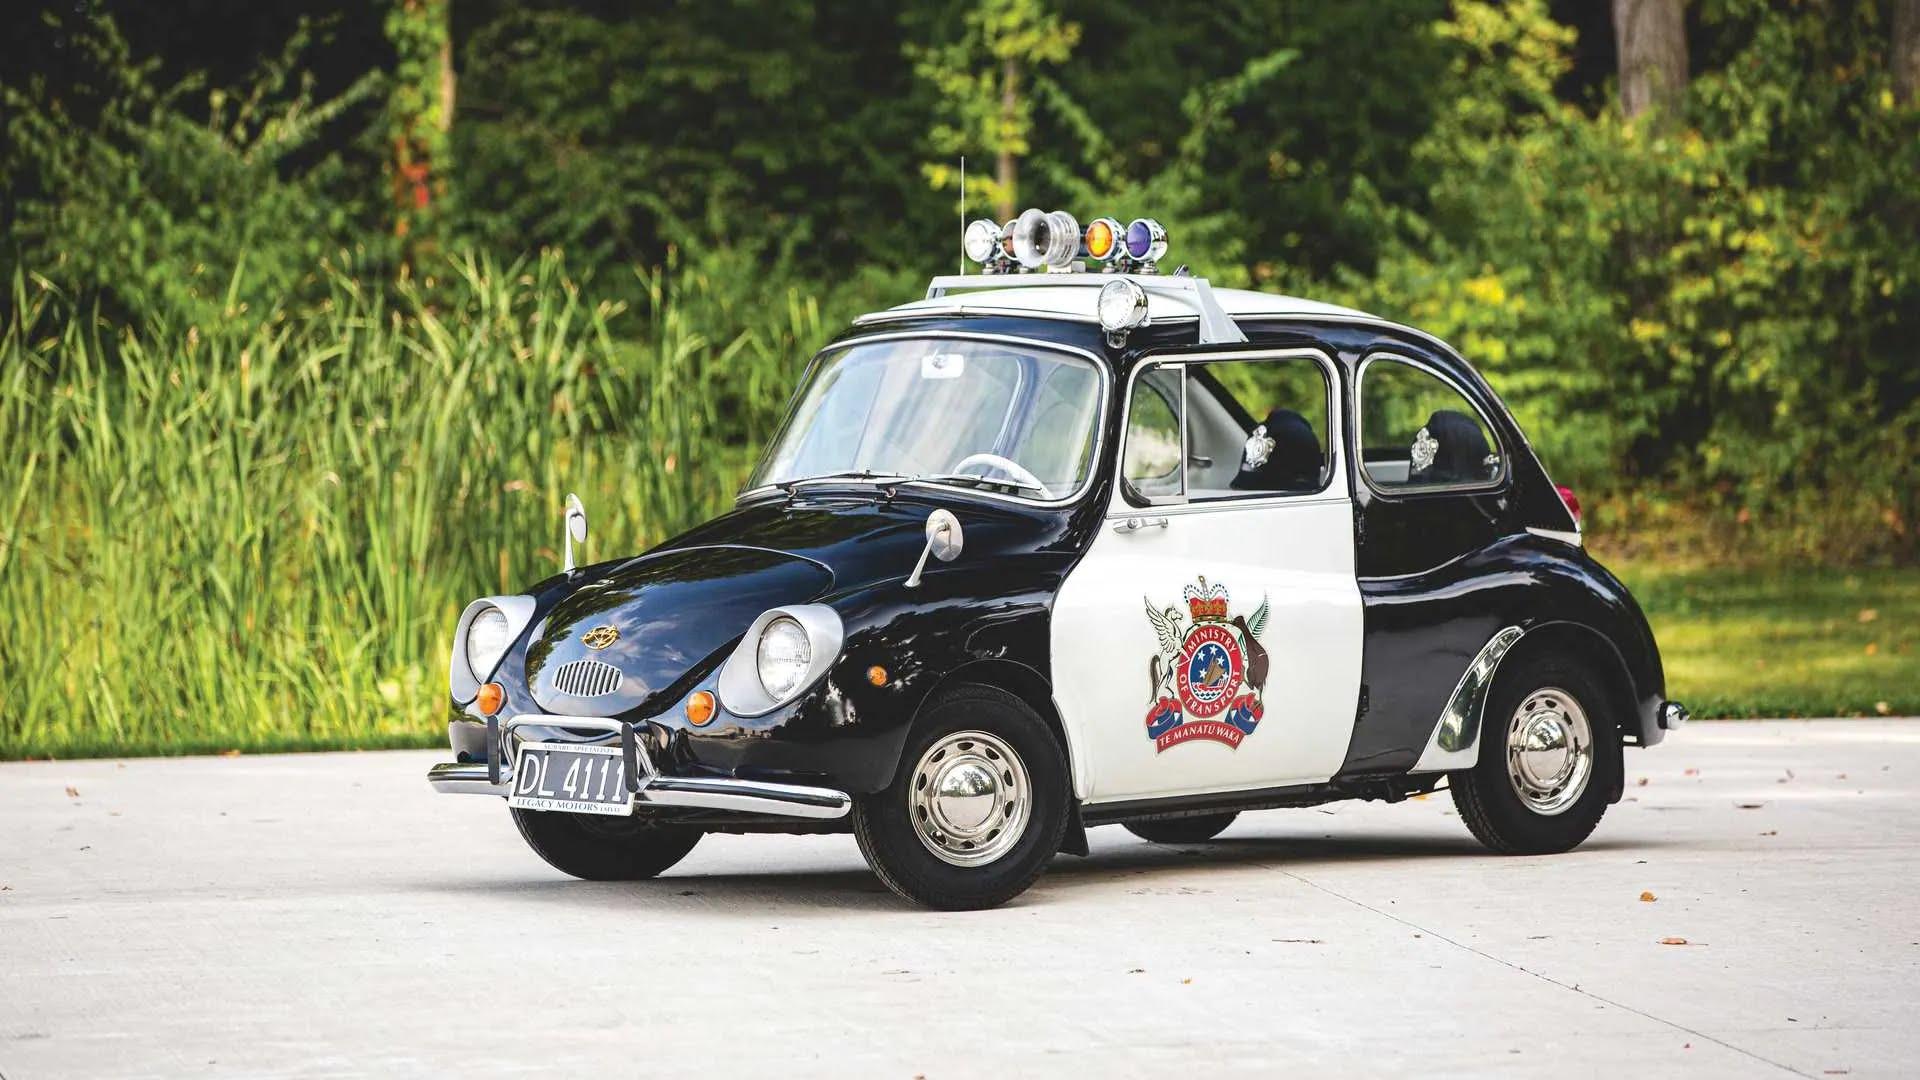 Subaru 360 New Zealand Police